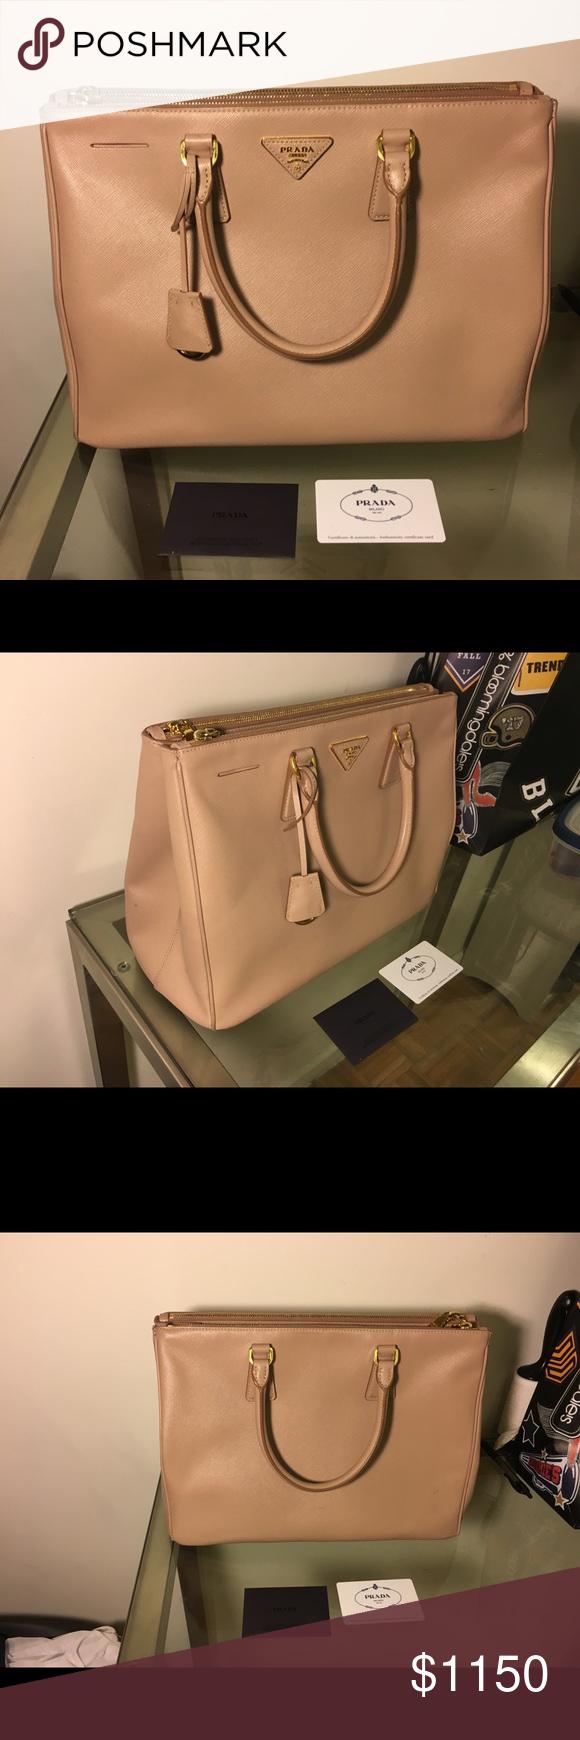 7b1dab6638eba4 ... low cost prada saffiano lux cammeo blush handbag bn 1786 lightly used  prada saffiano lux cammeo